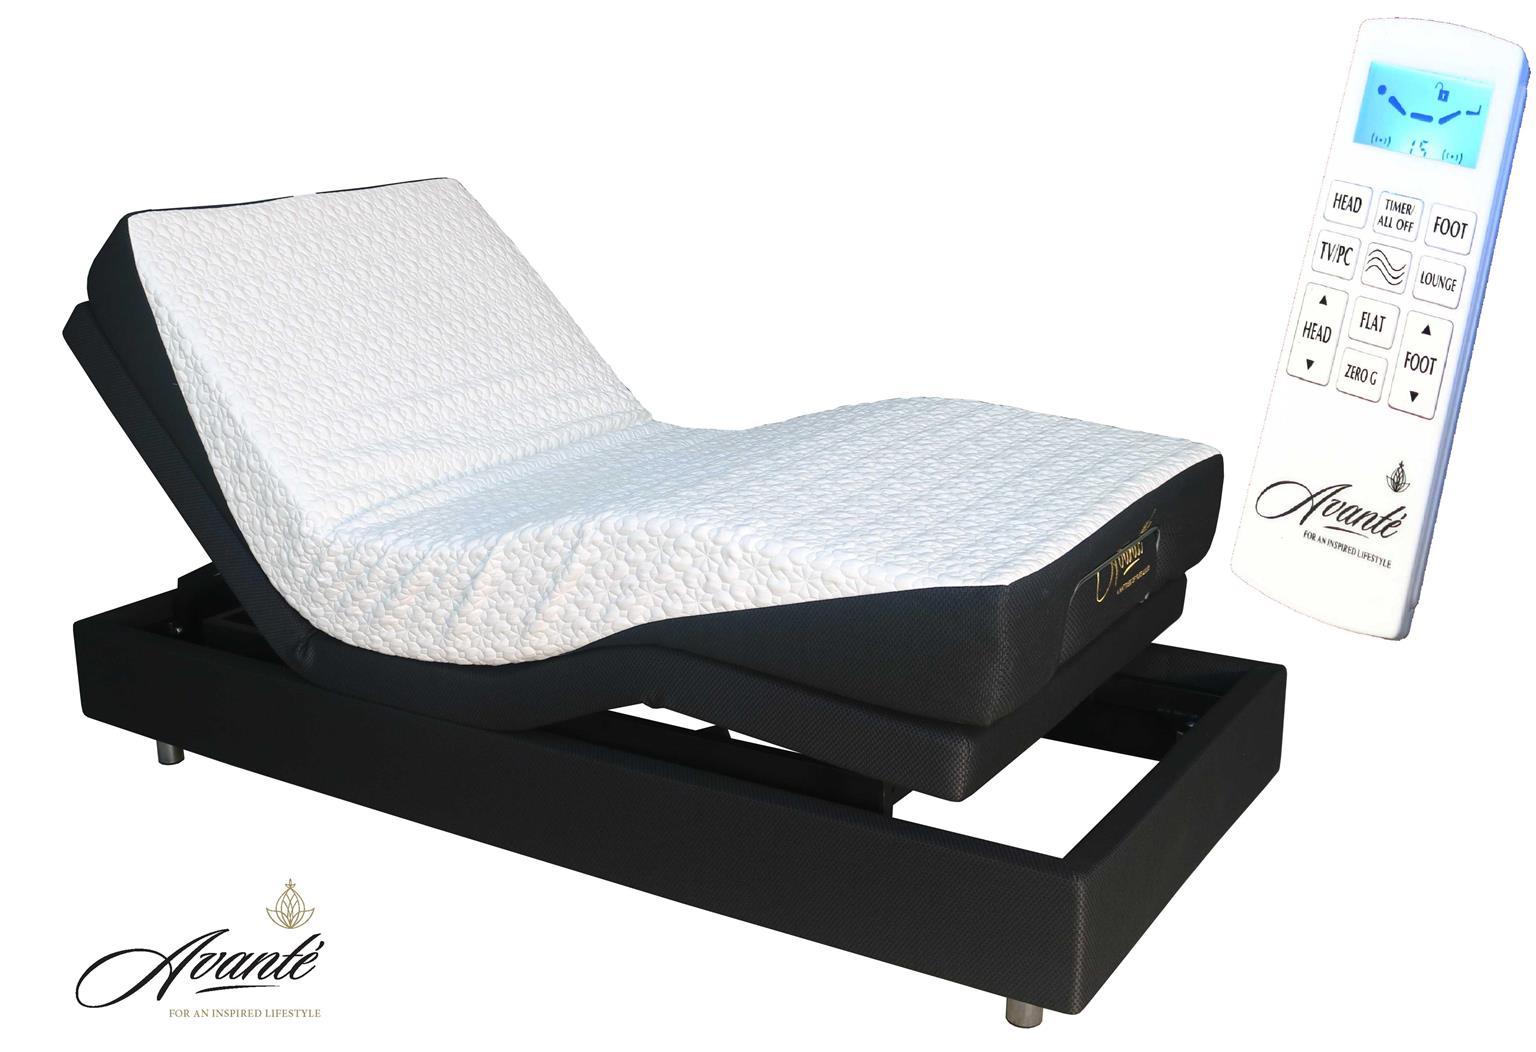 Electric Adjustable Bed - SmartFlex V2 with massage function. FREE DELIVERY